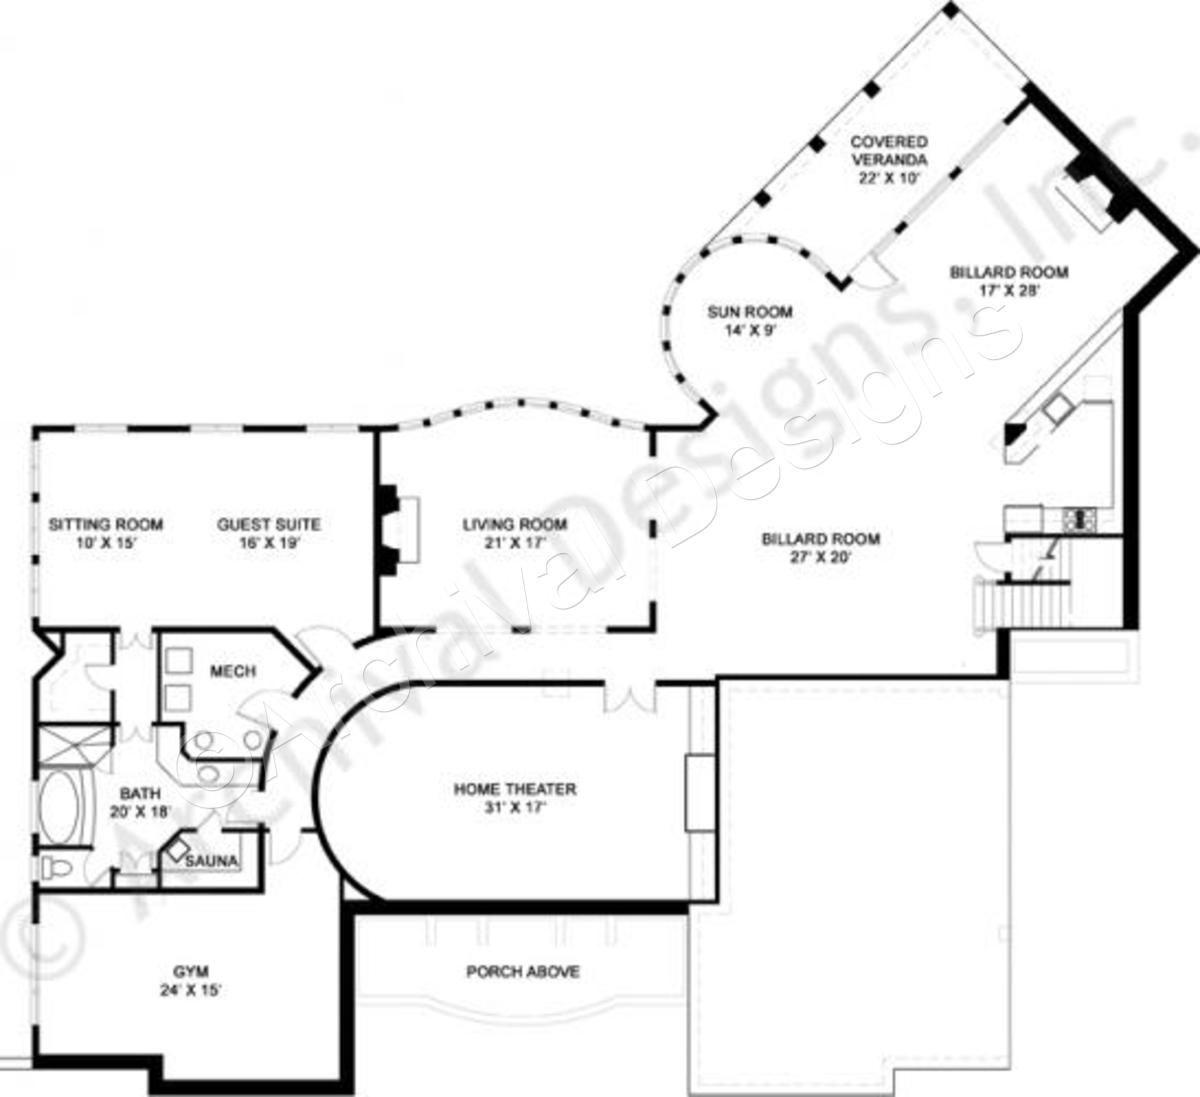 mayerilla house plan basement floor plan basementflooringideas rh pinterest com